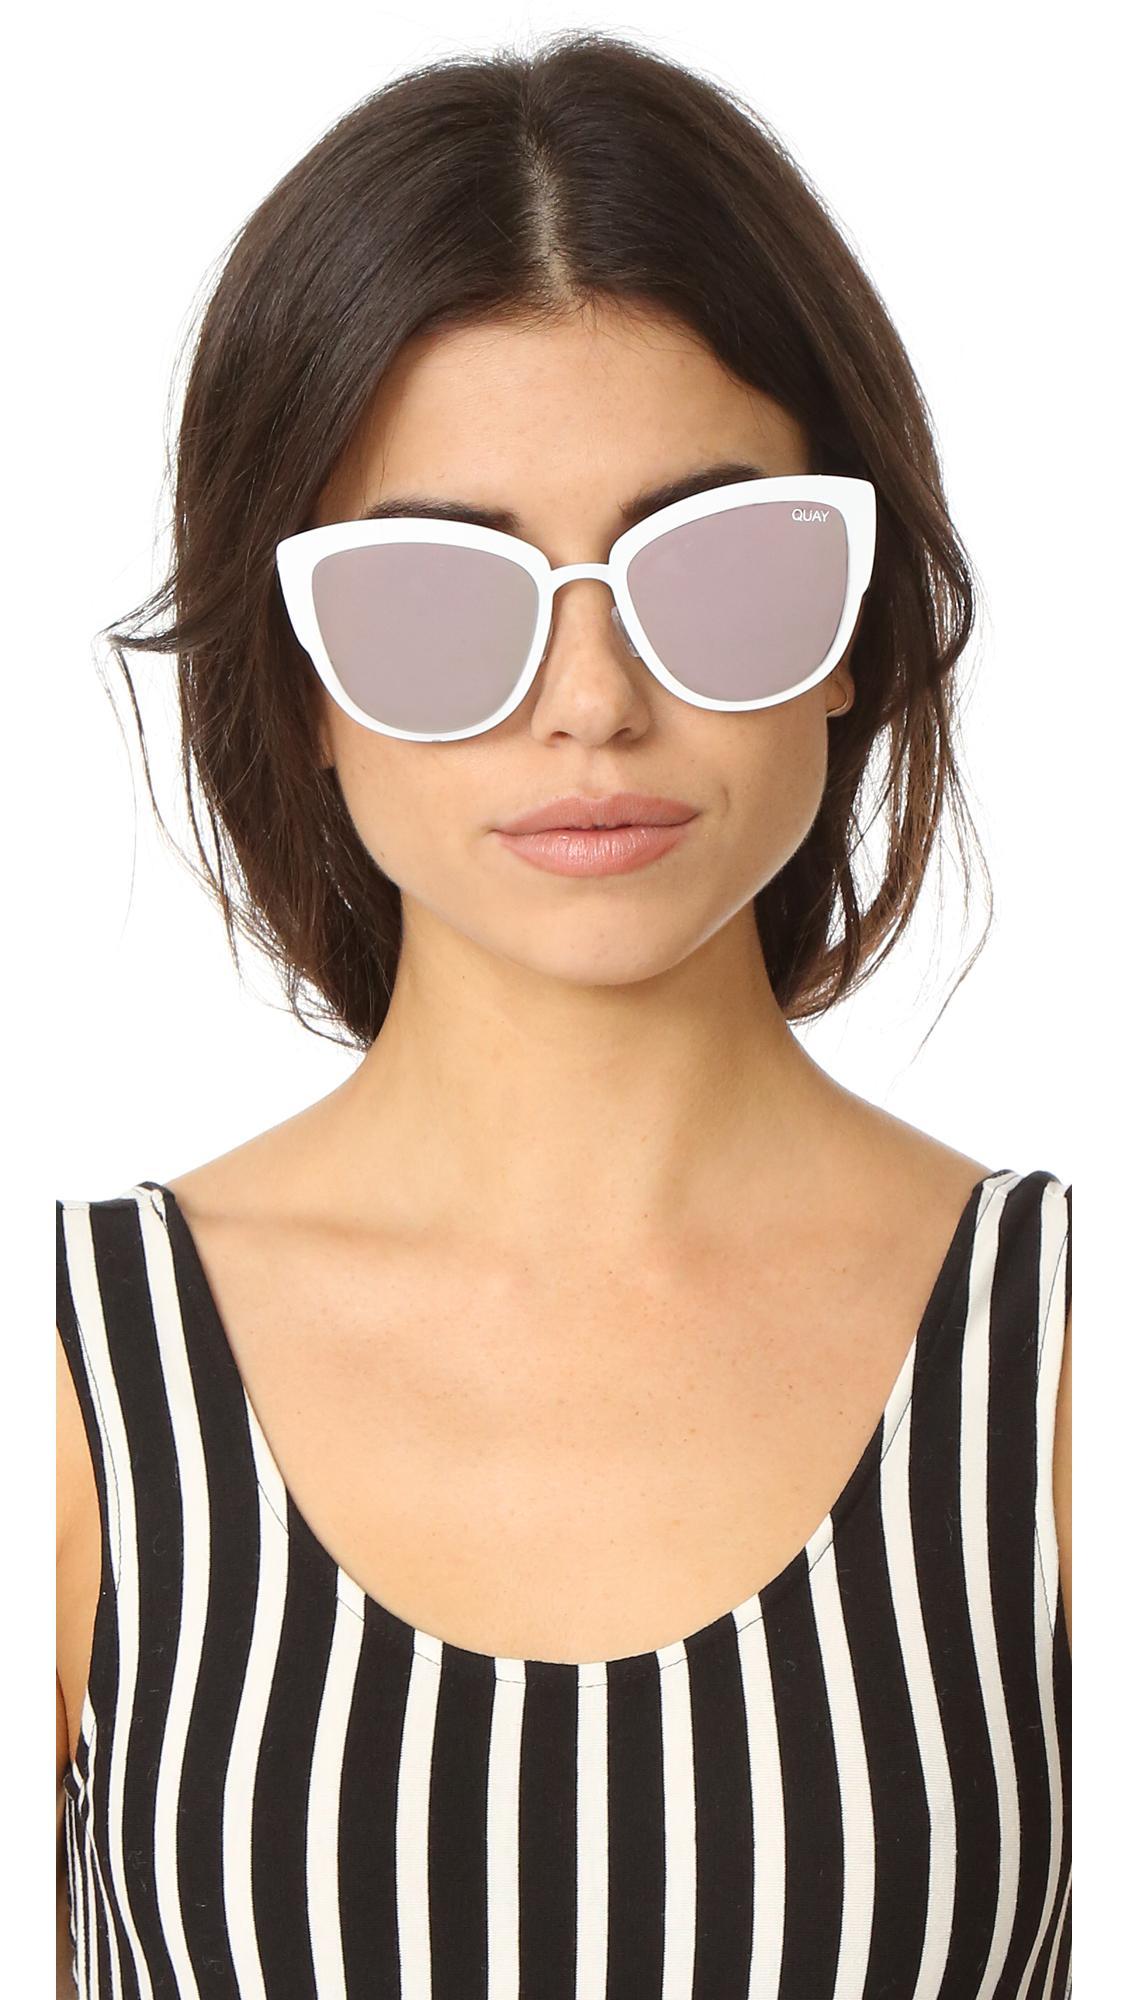 223873eeb1 Quay Supergirl Sunglasses in White